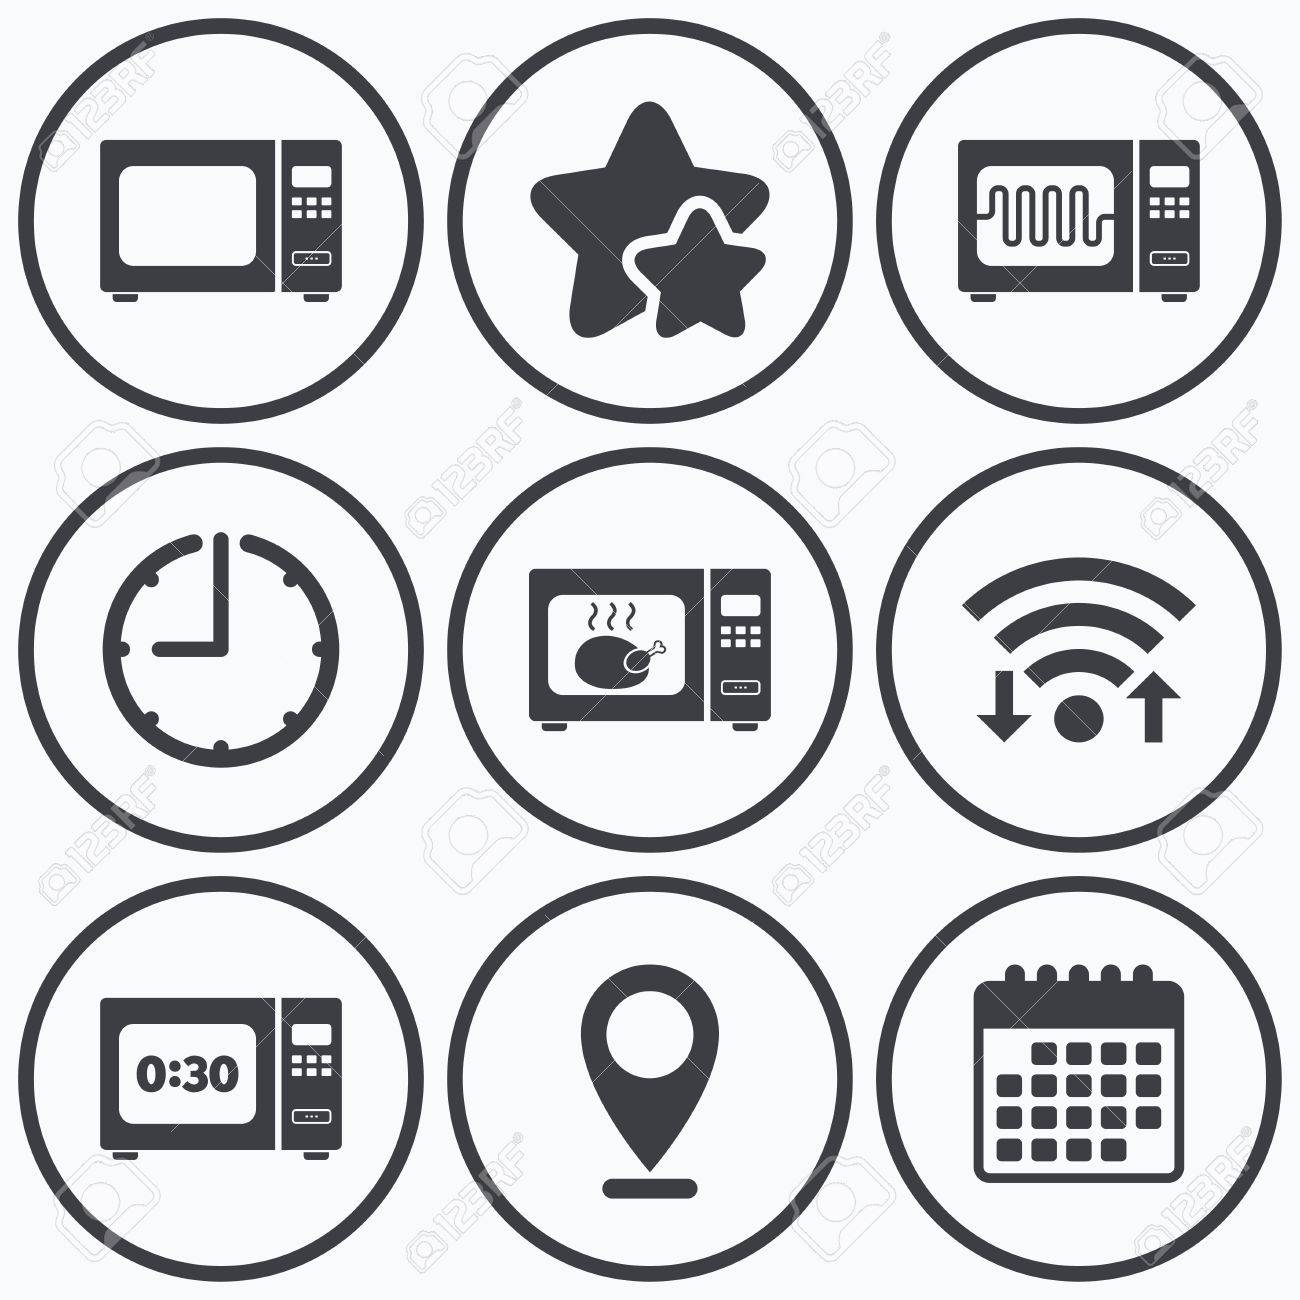 Clock wifi and stars icons microwave oven icons cook in electric microwave oven icons cook in electric stove symbols buycottarizona Image collections